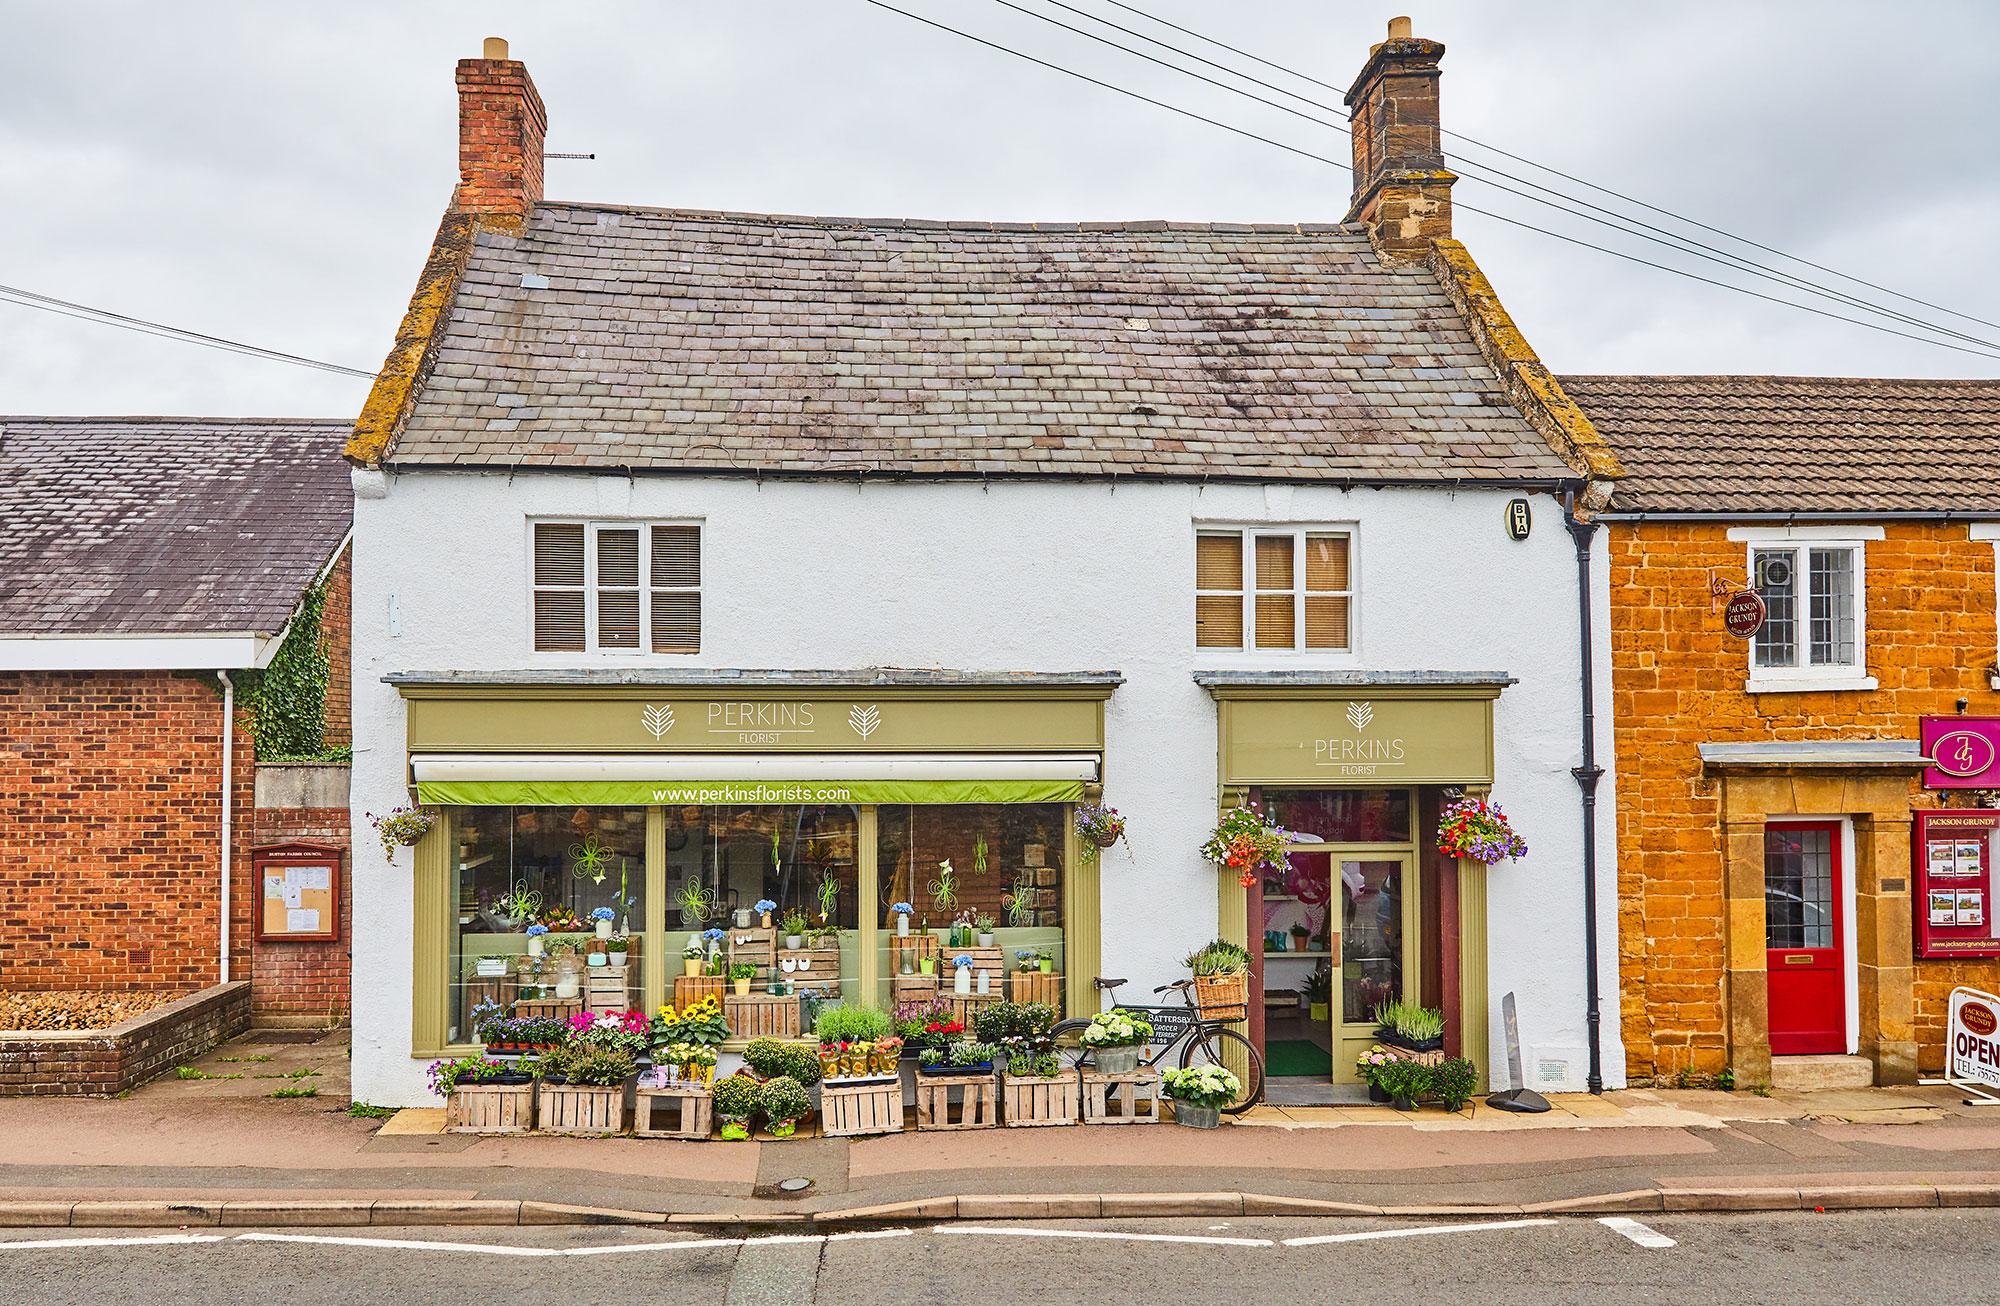 perkins-florists-duston-northamptonshire-25.jpg